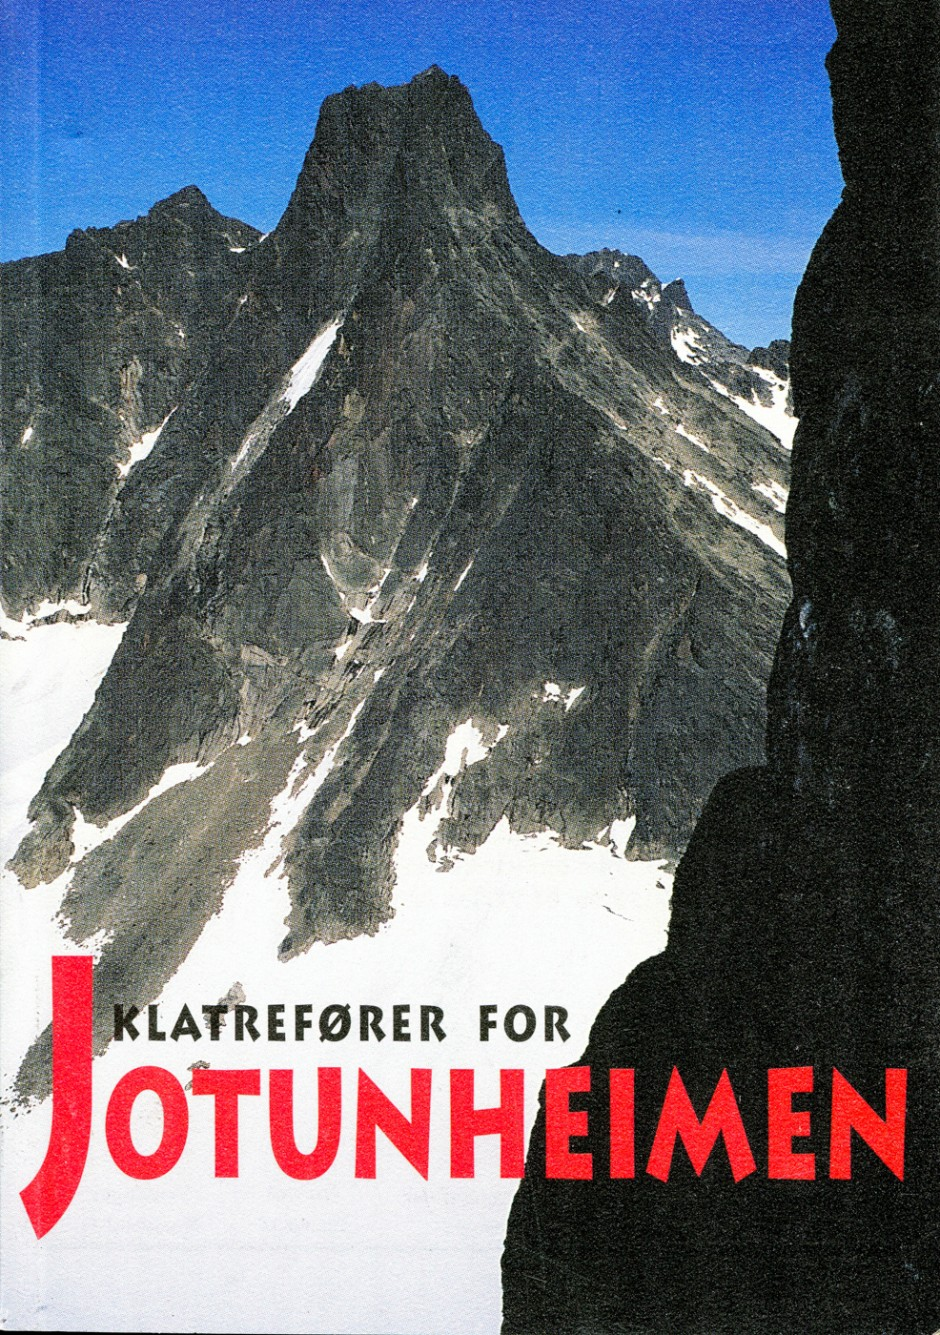 Jotunheimen 1996 - 600 dpi